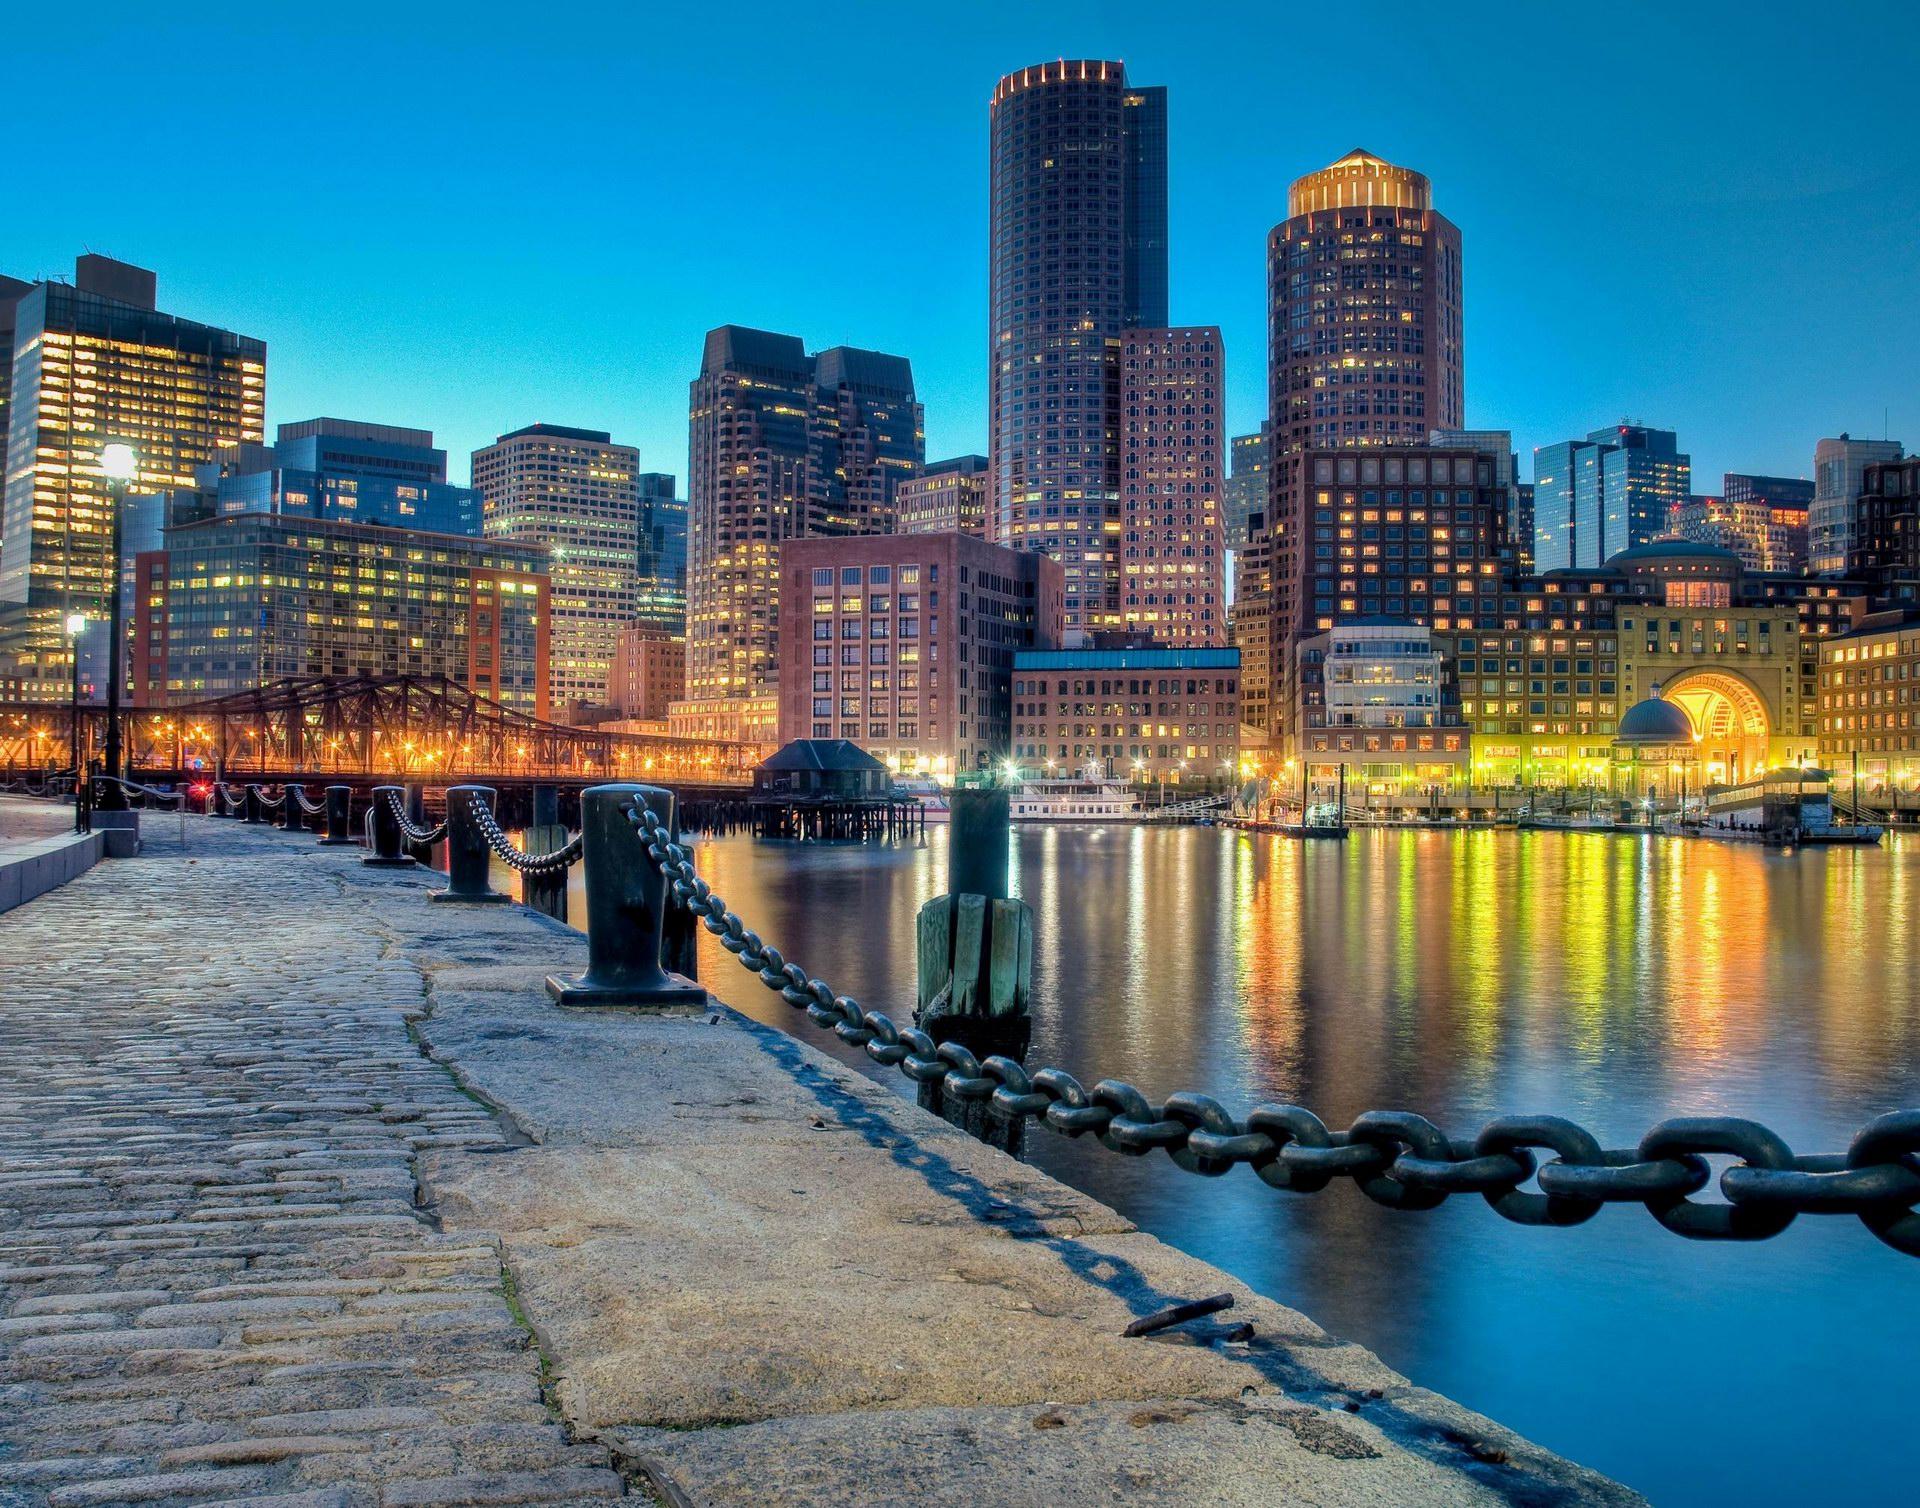 Hd wallpaper travel - Boston At Night Travel World Wallpapers Boston At Night